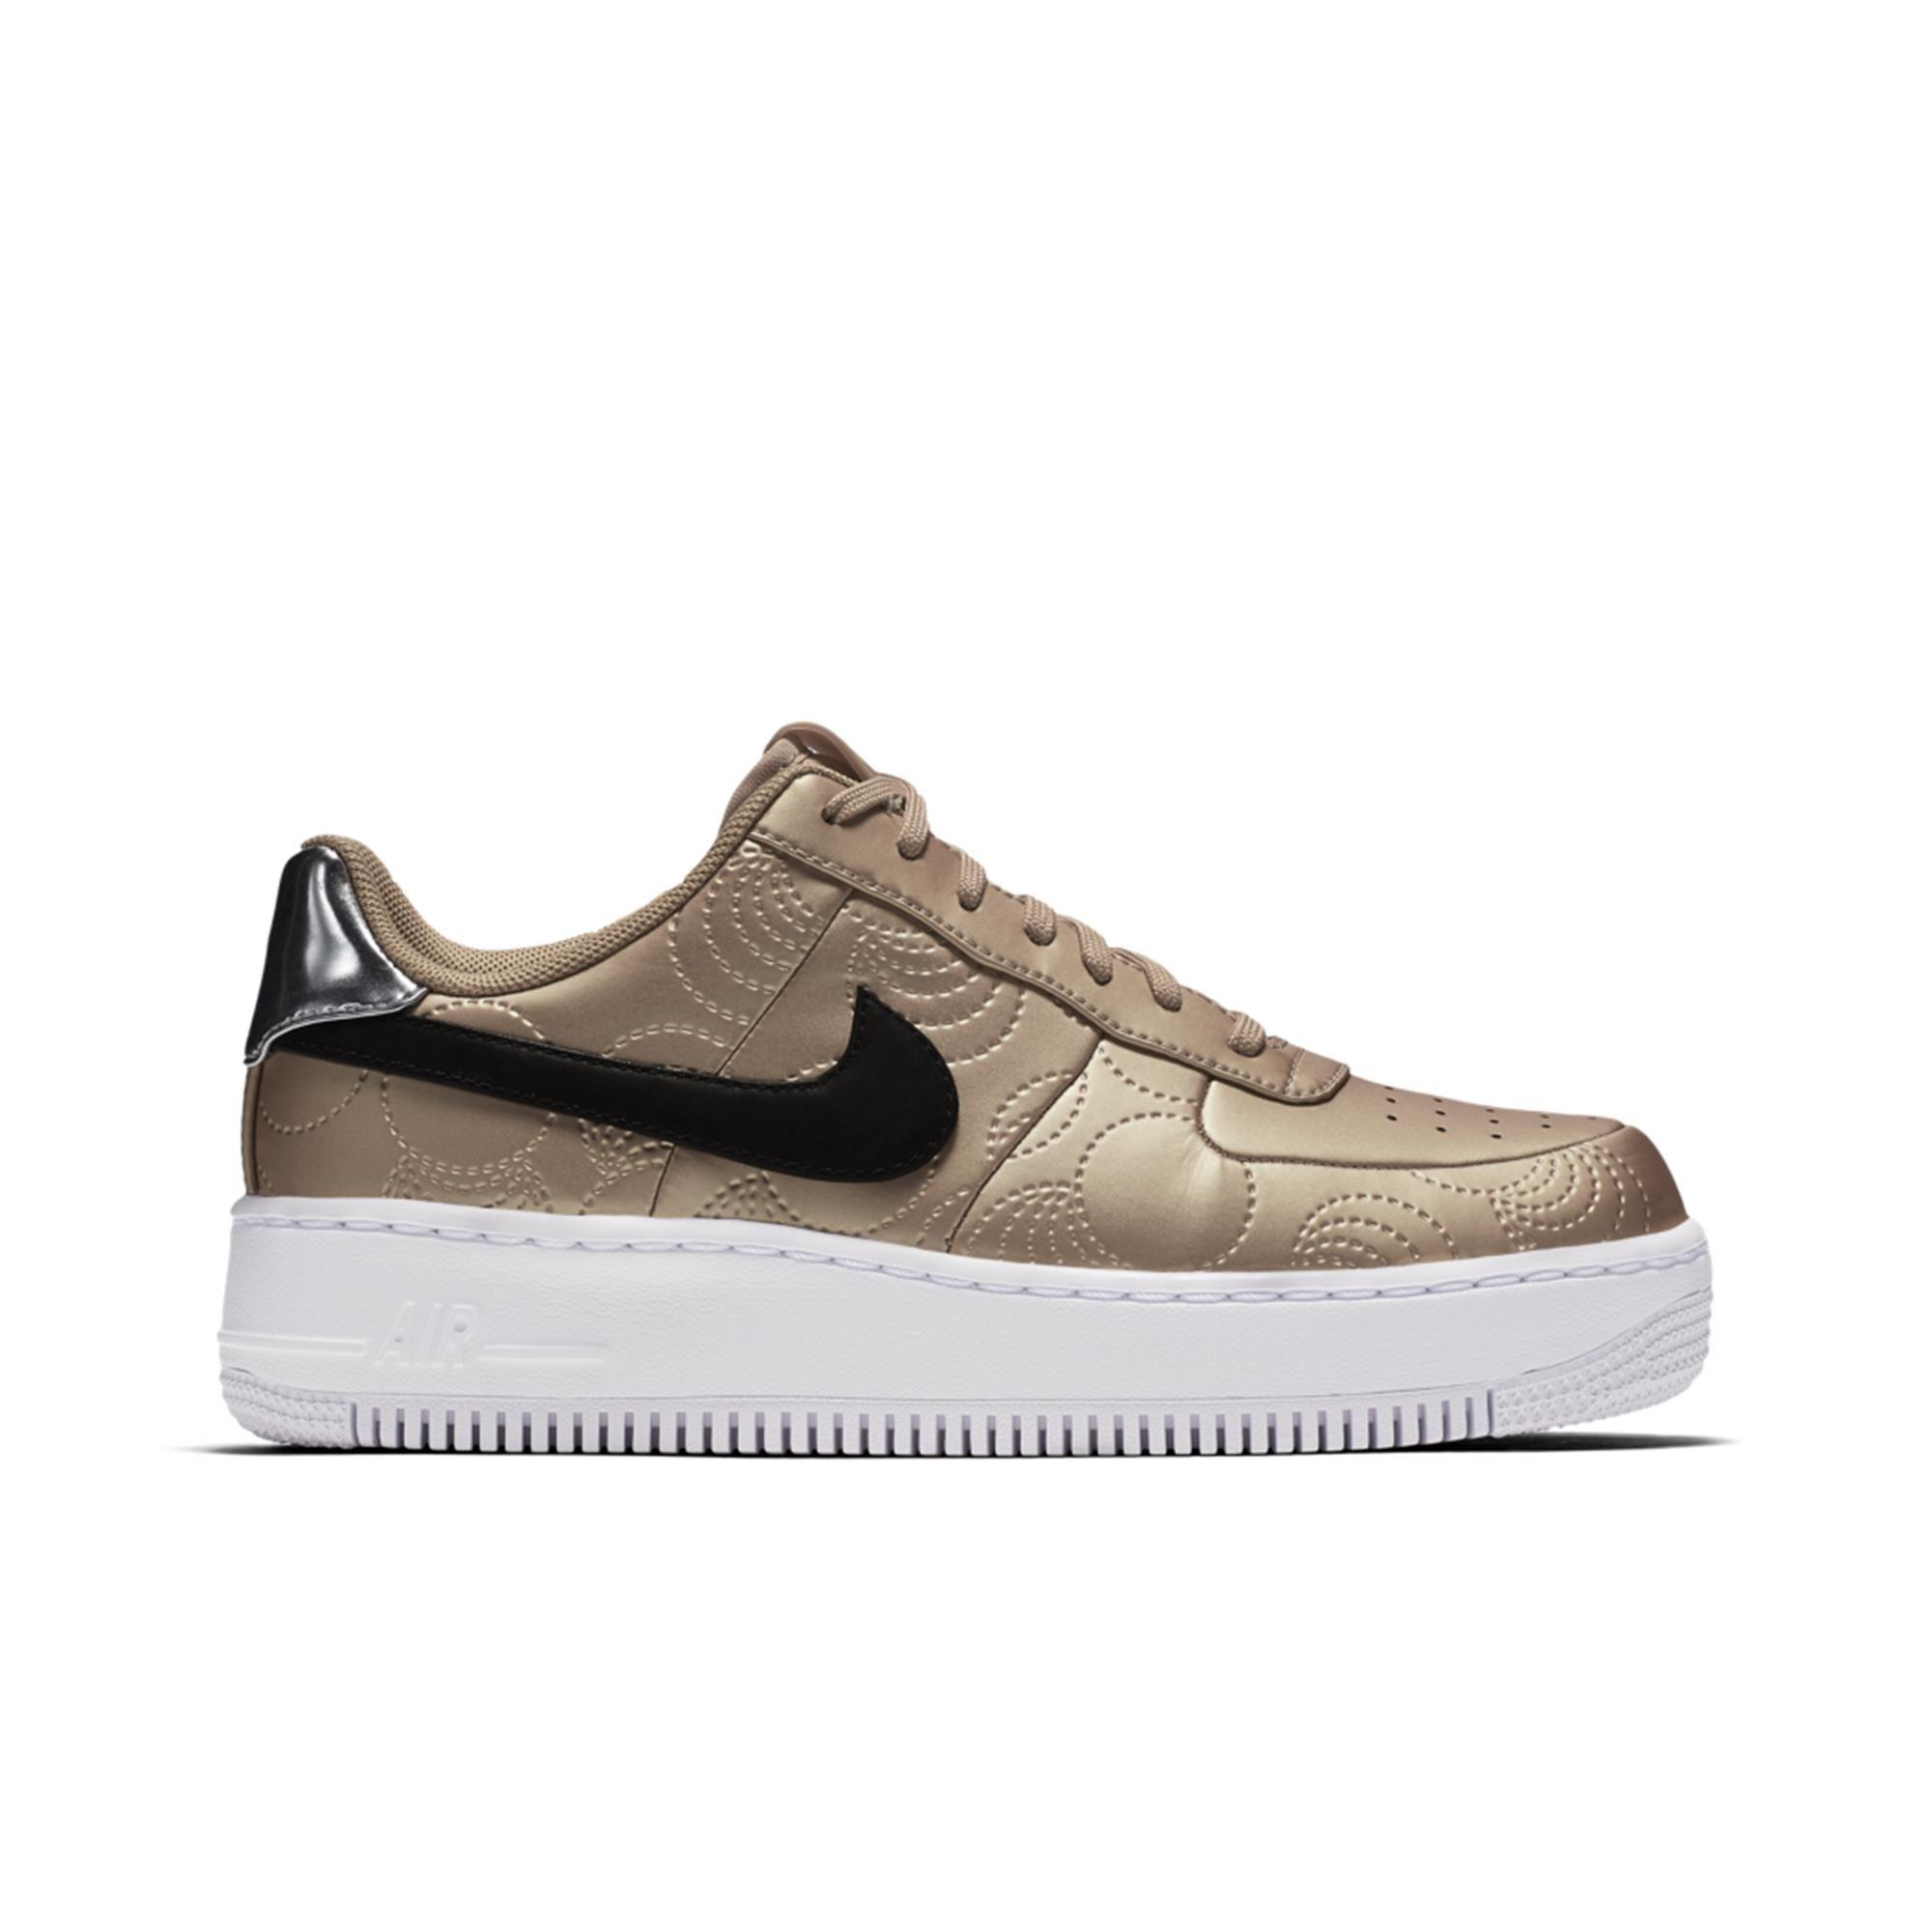 Tênis Nike Air Force 1 Upstep LOTC QS Feminino  1e4811fbacad5